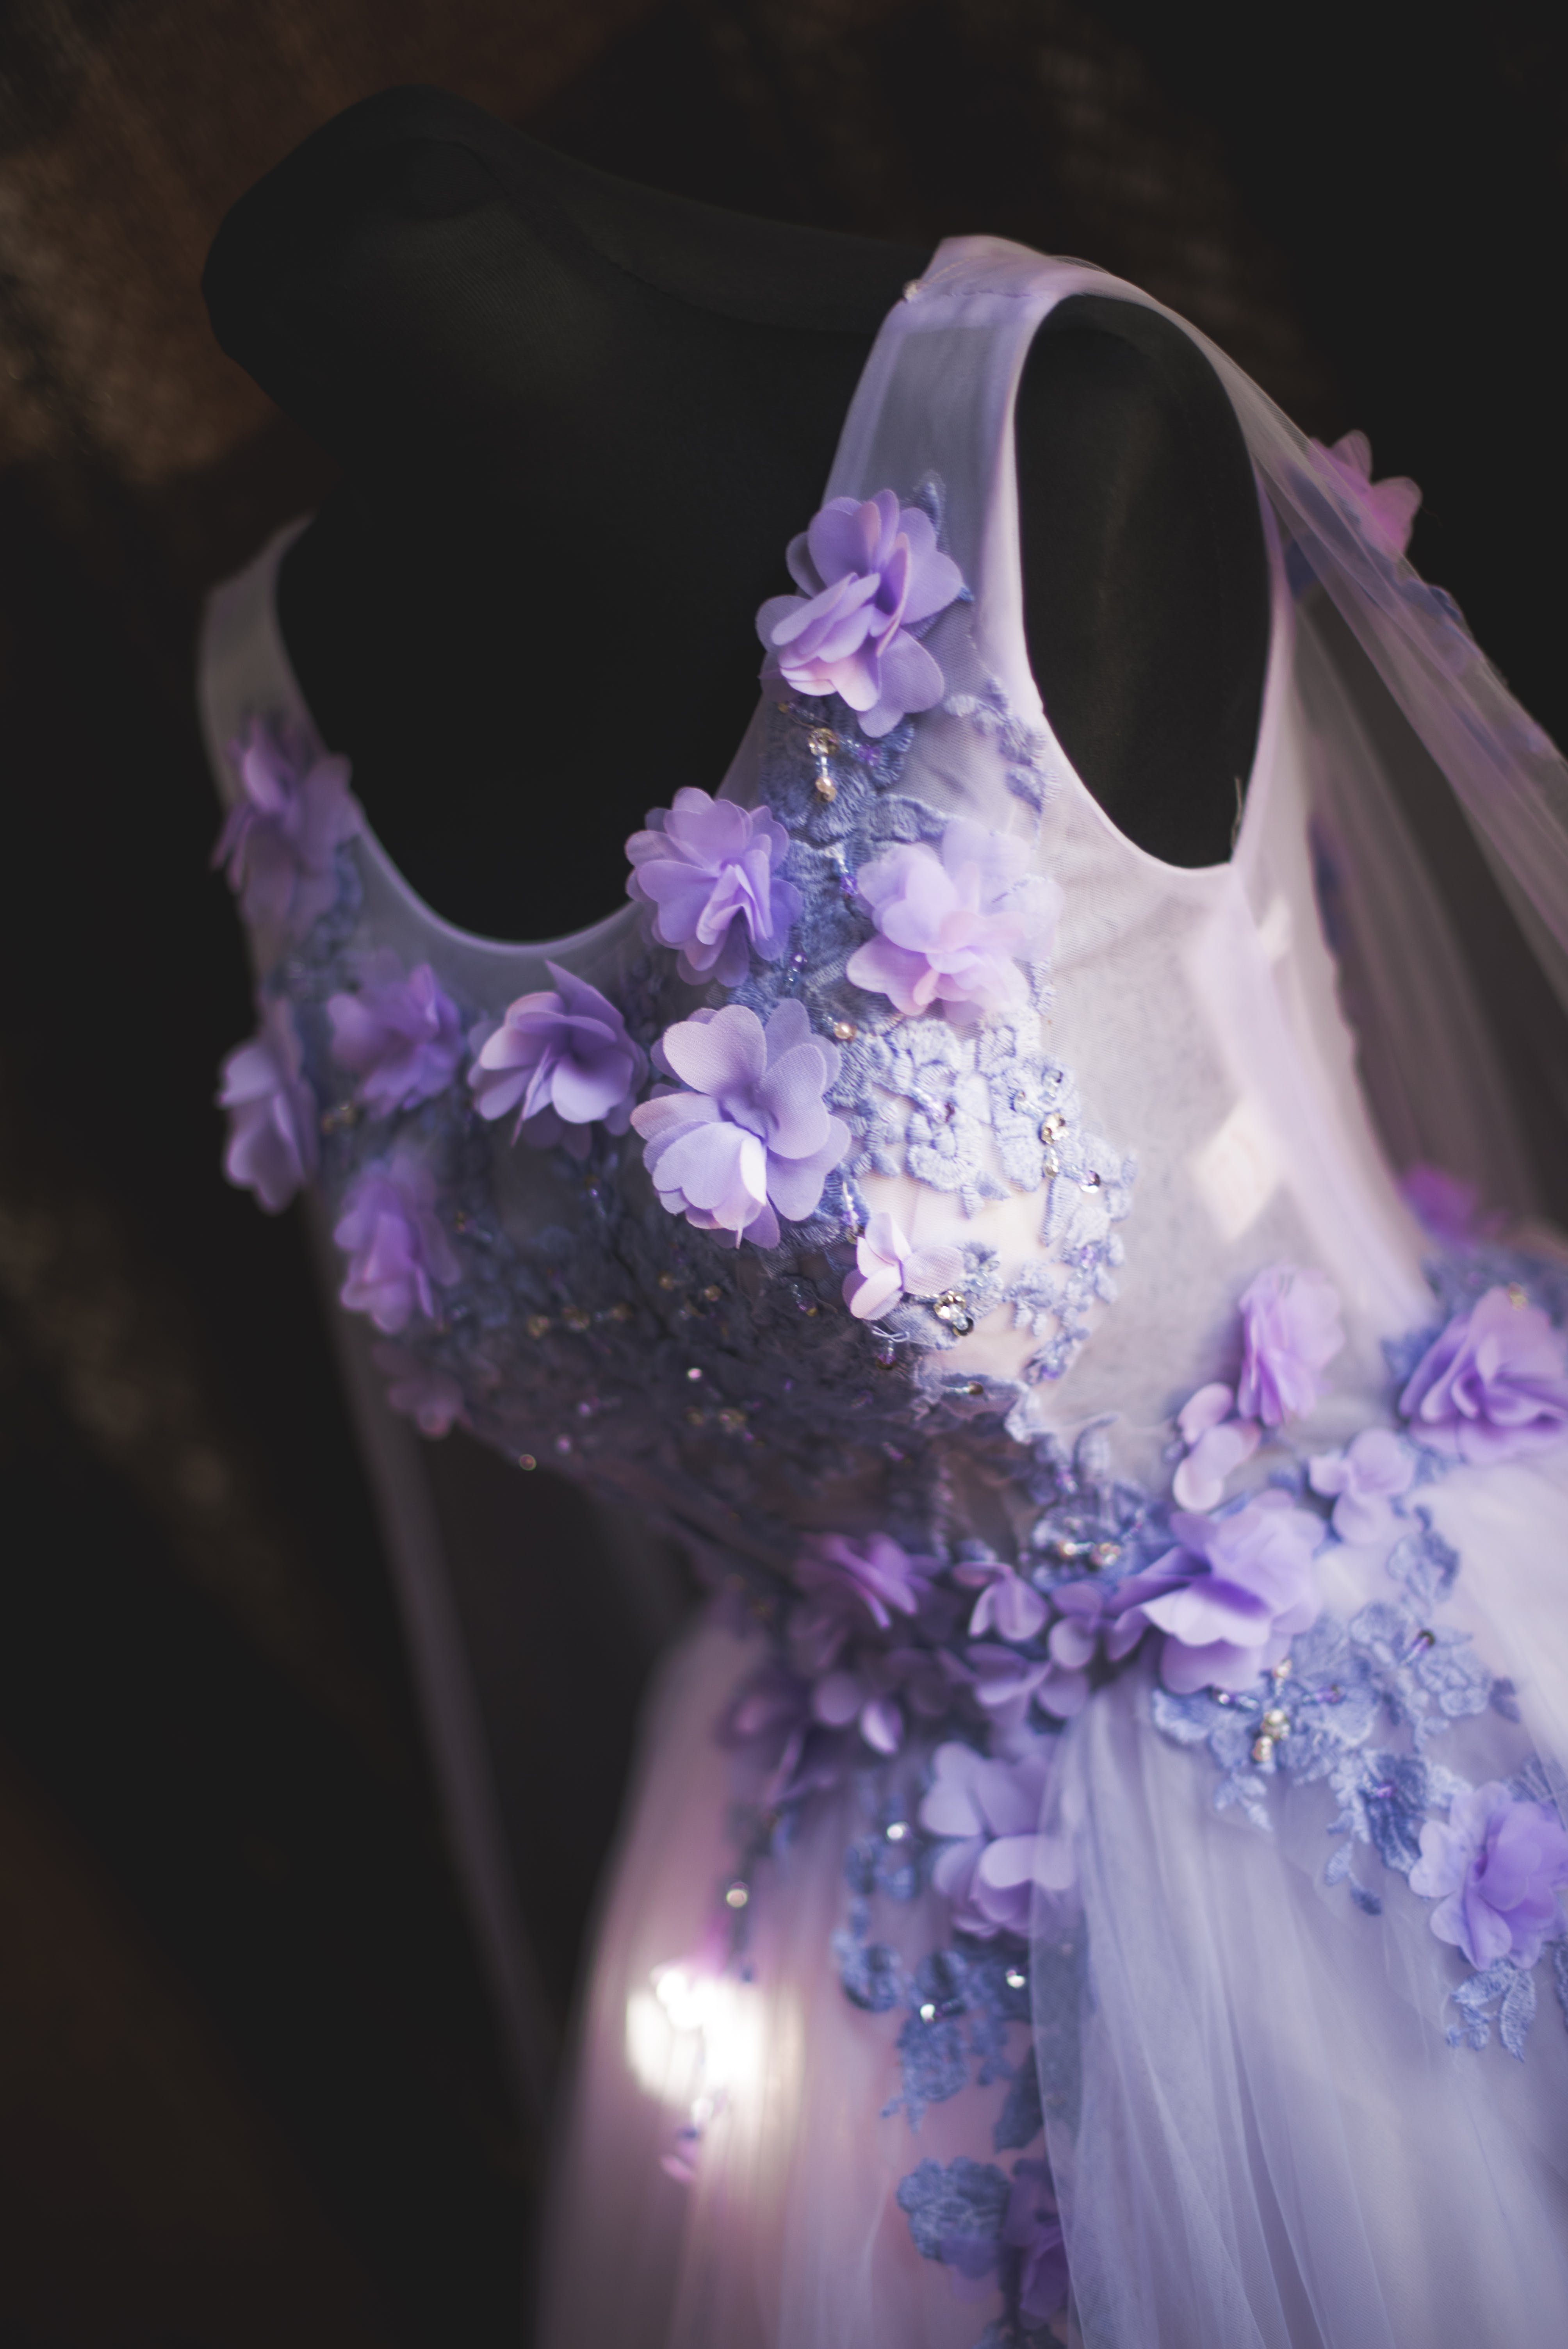 Women's White and Purple Sleeveless Dress on Black Mannequin